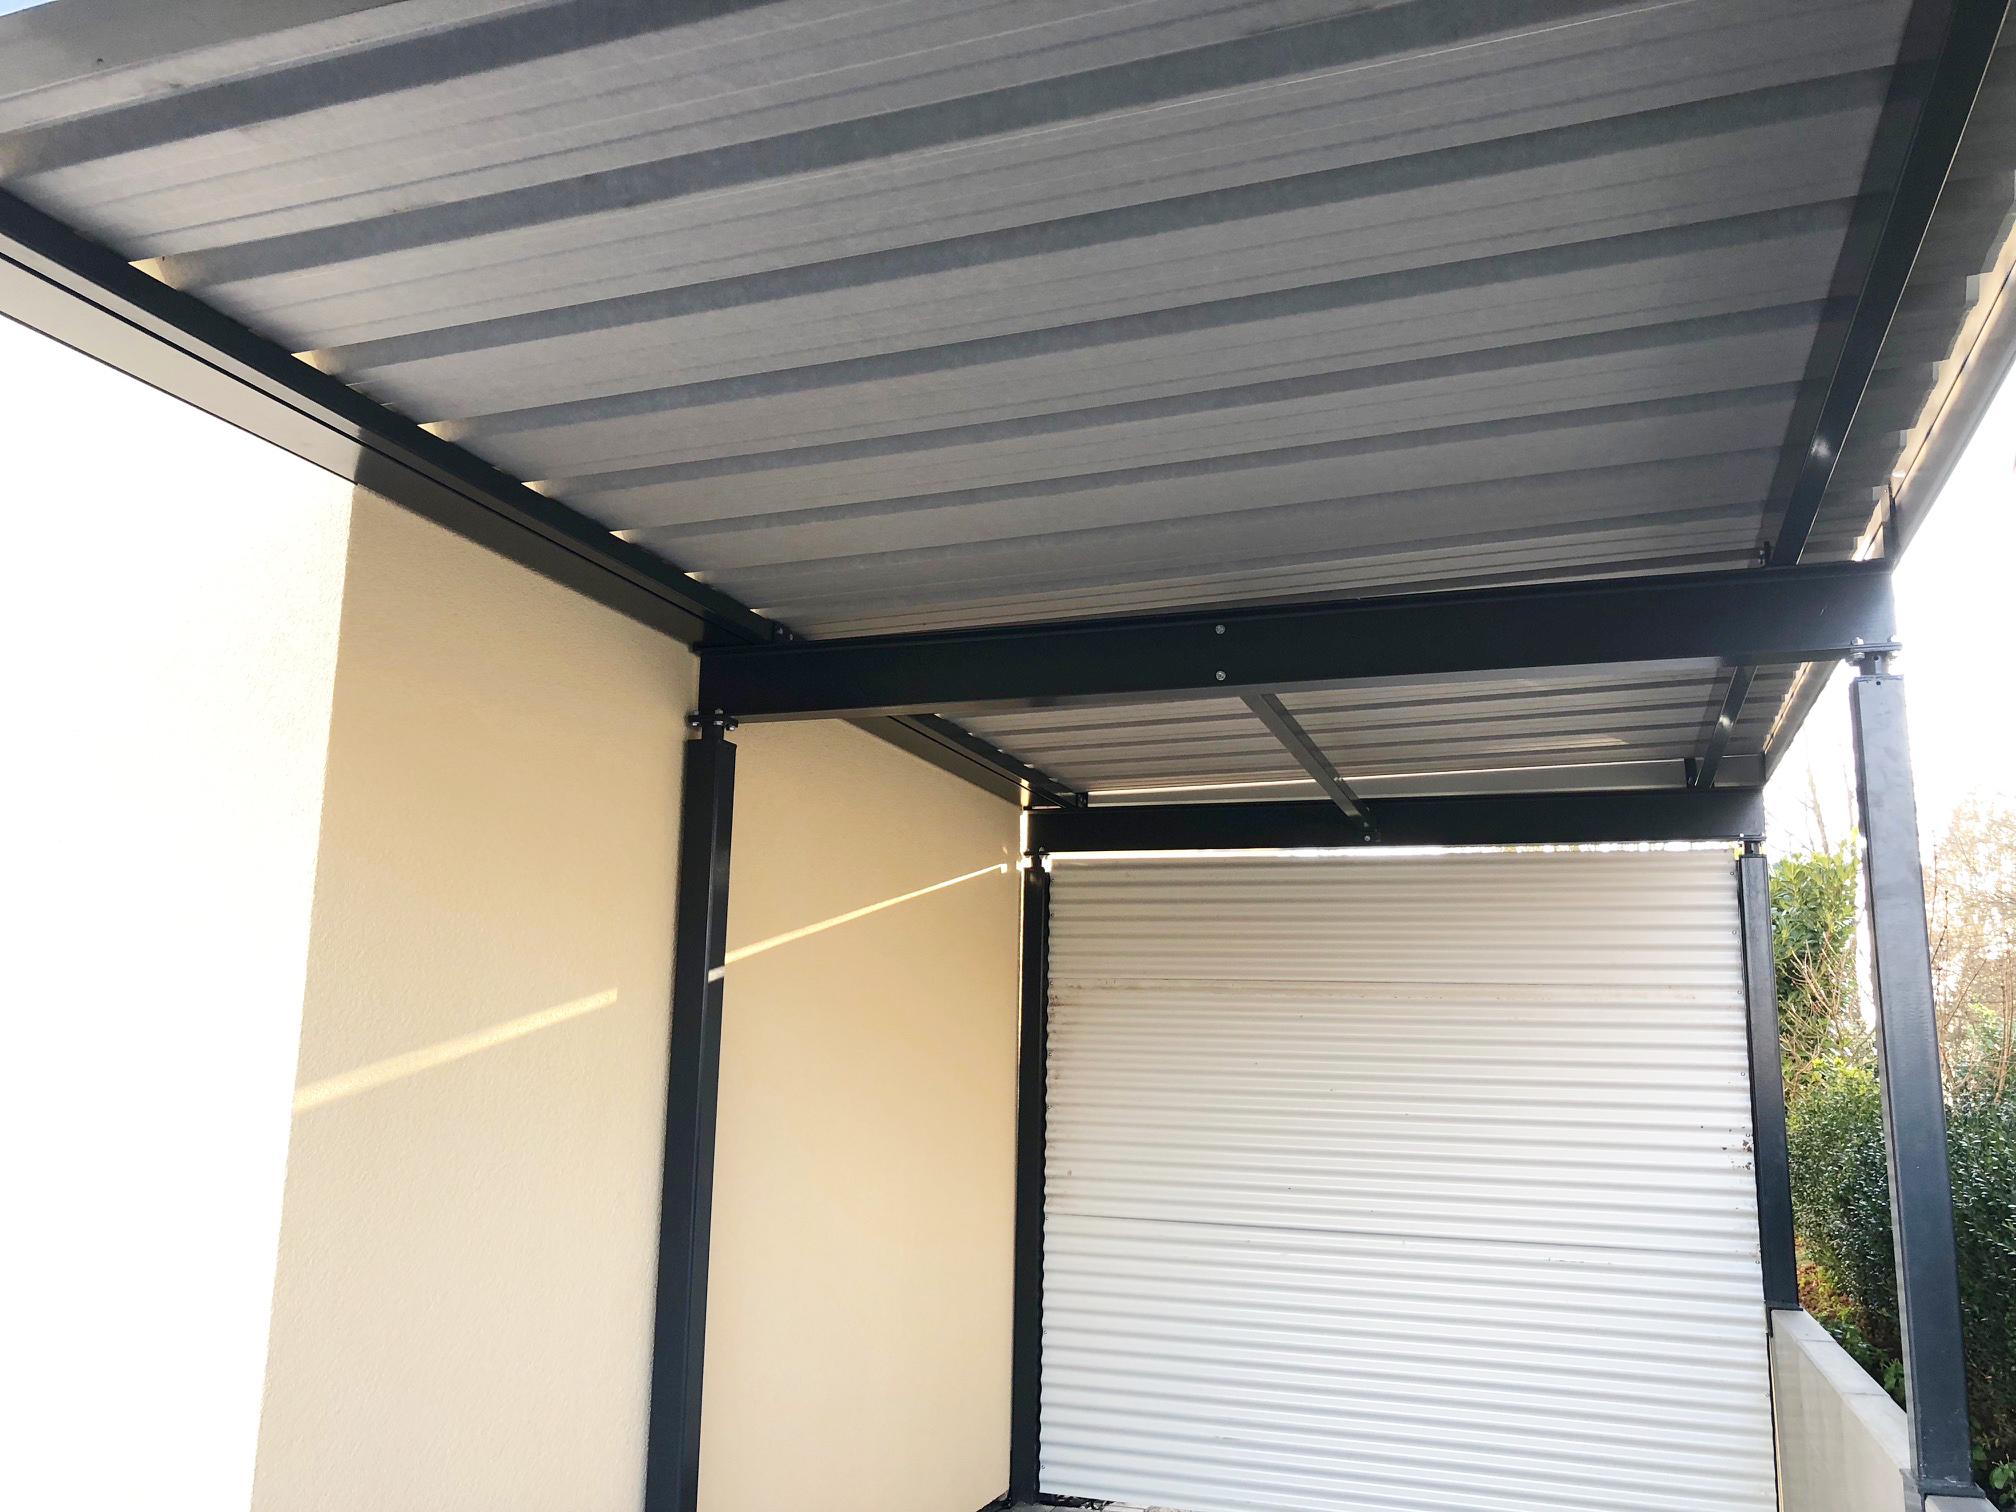 Anbindung an Haus mit Dachrinne